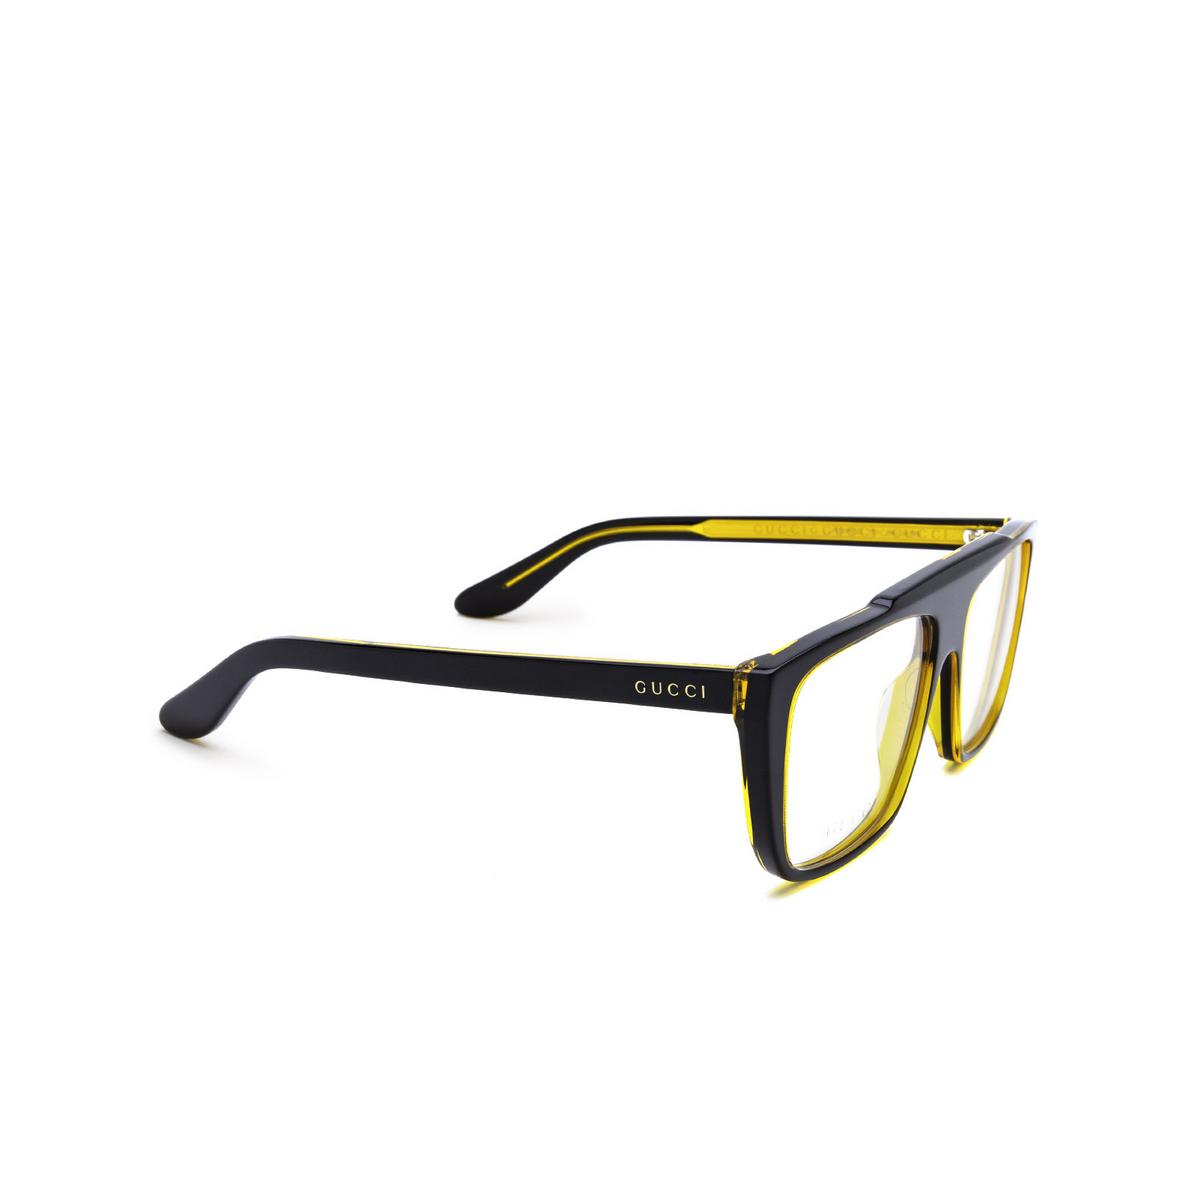 Gucci® Square Eyeglasses: GG1040O color Black & Amber 001 - three-quarters view.